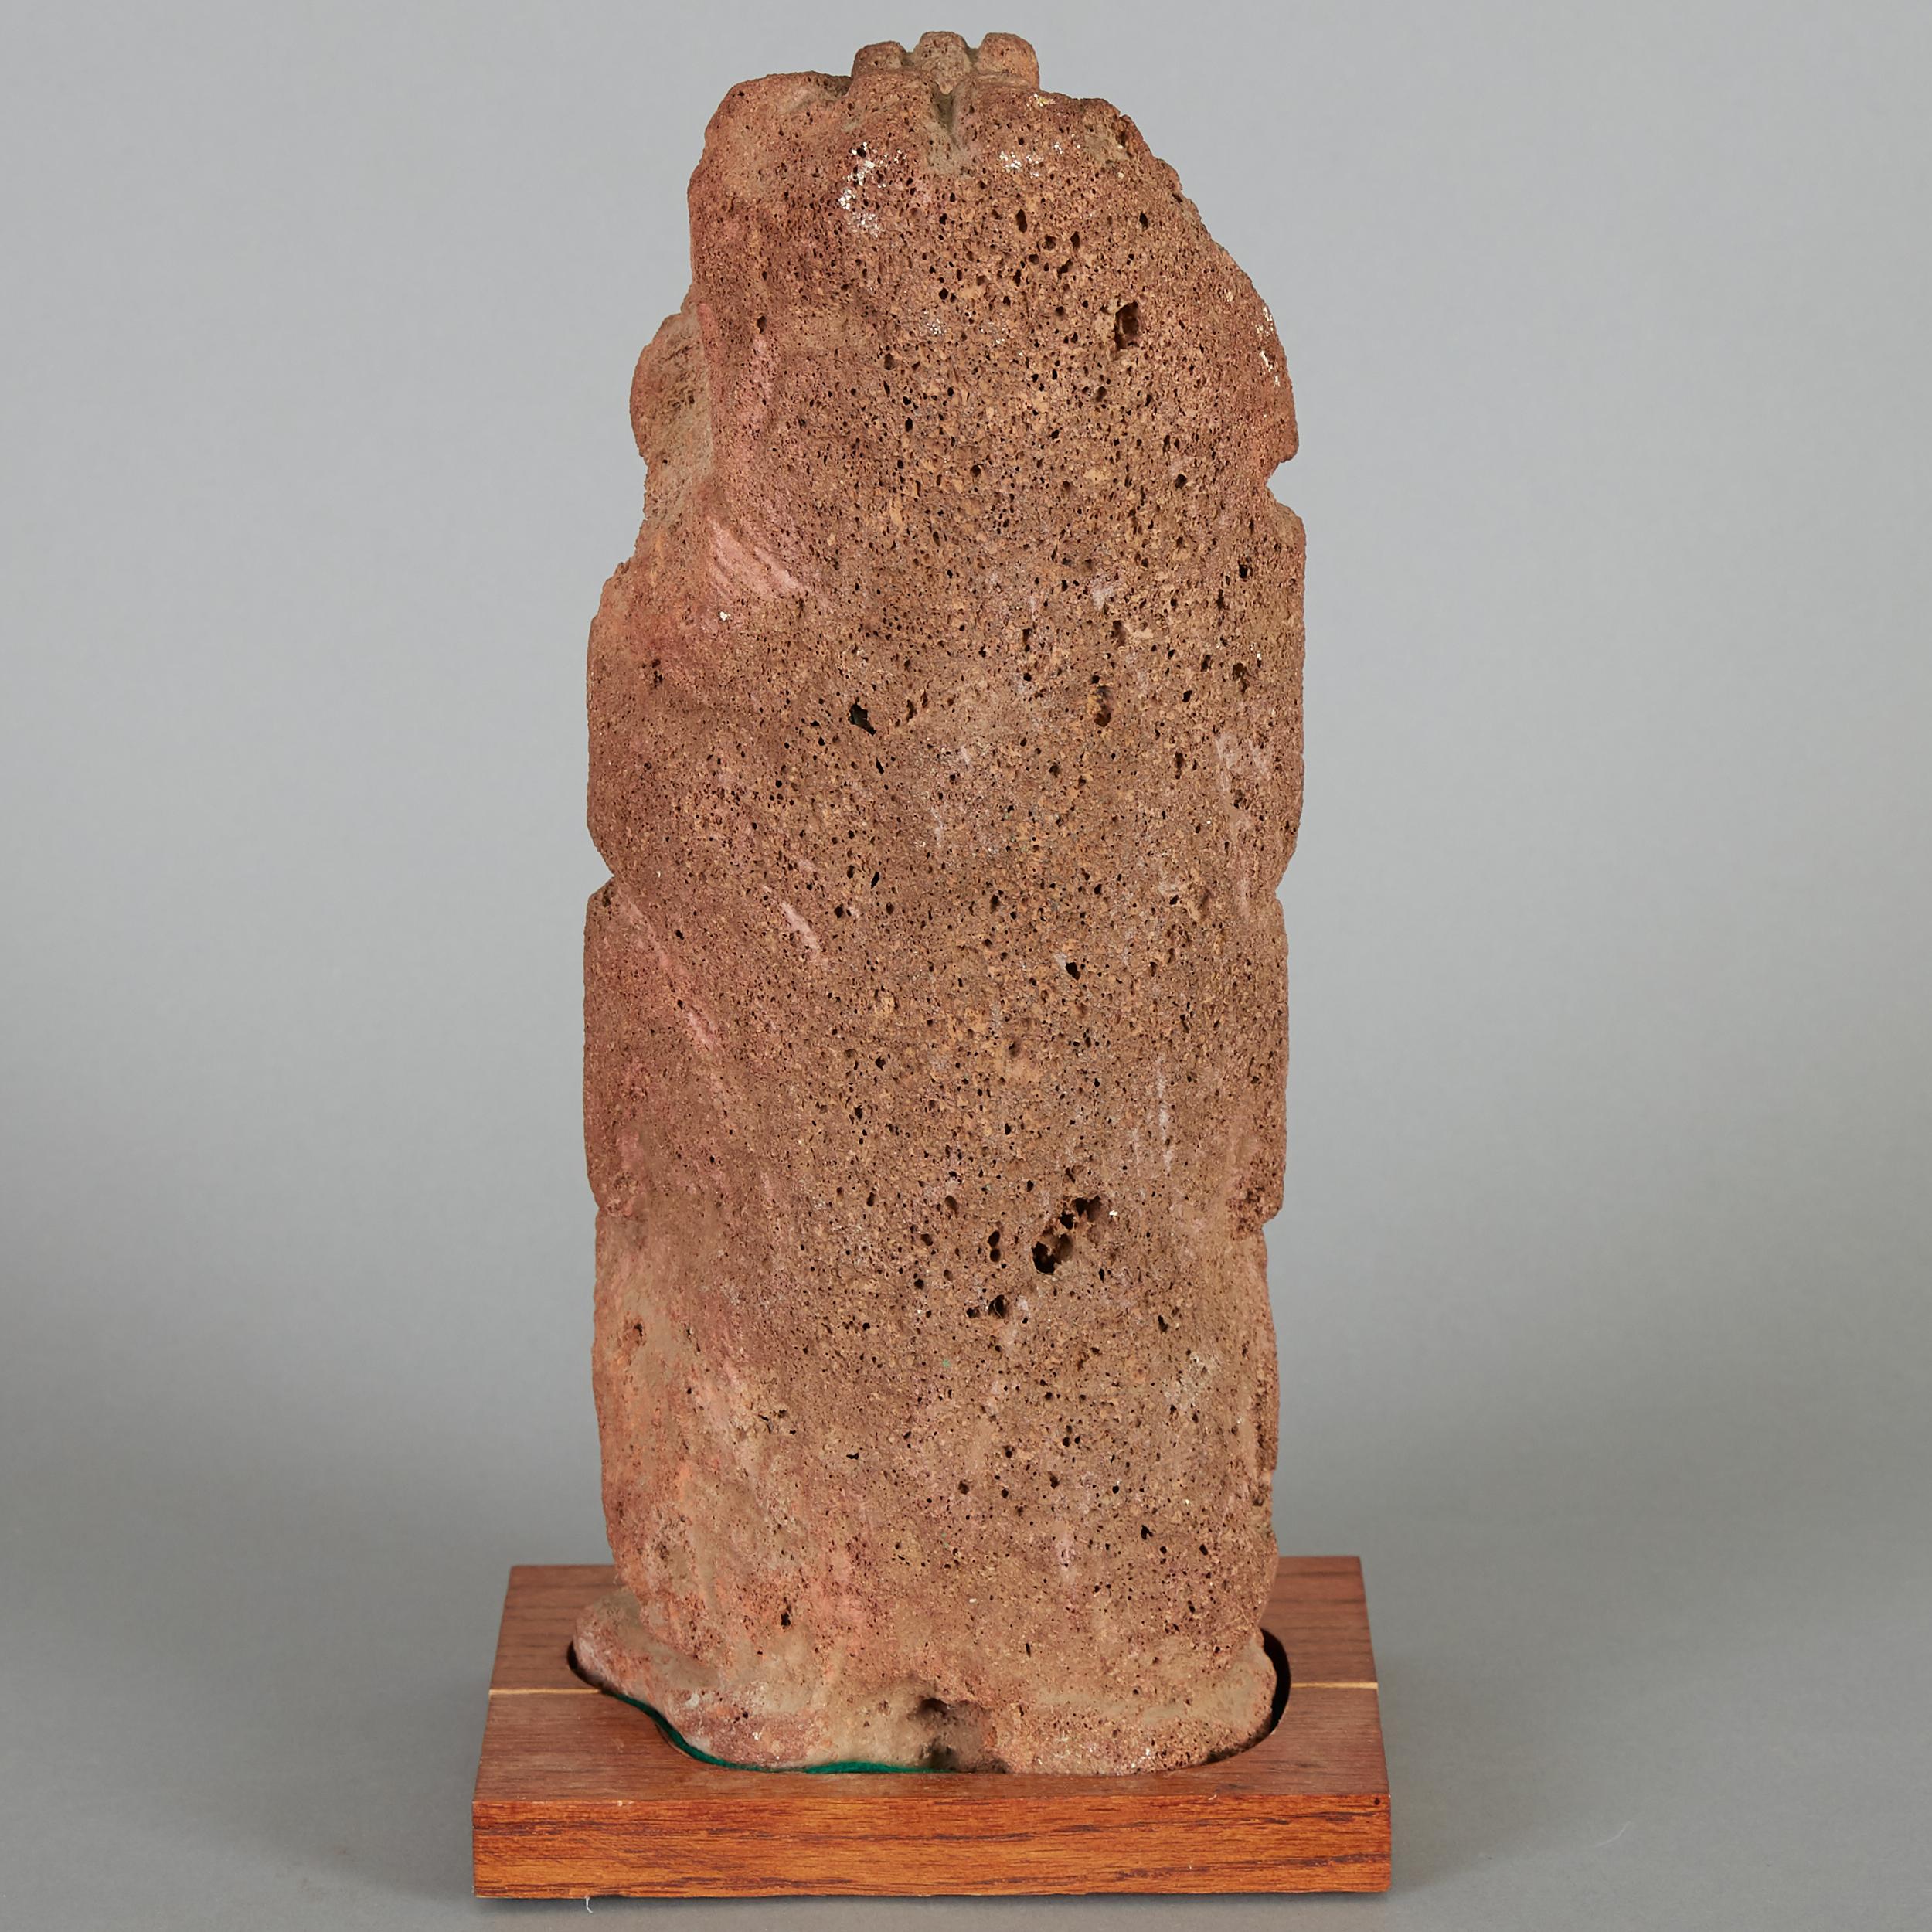 Lot 177 - Pre-Columbian Ticoman Fire God Statue